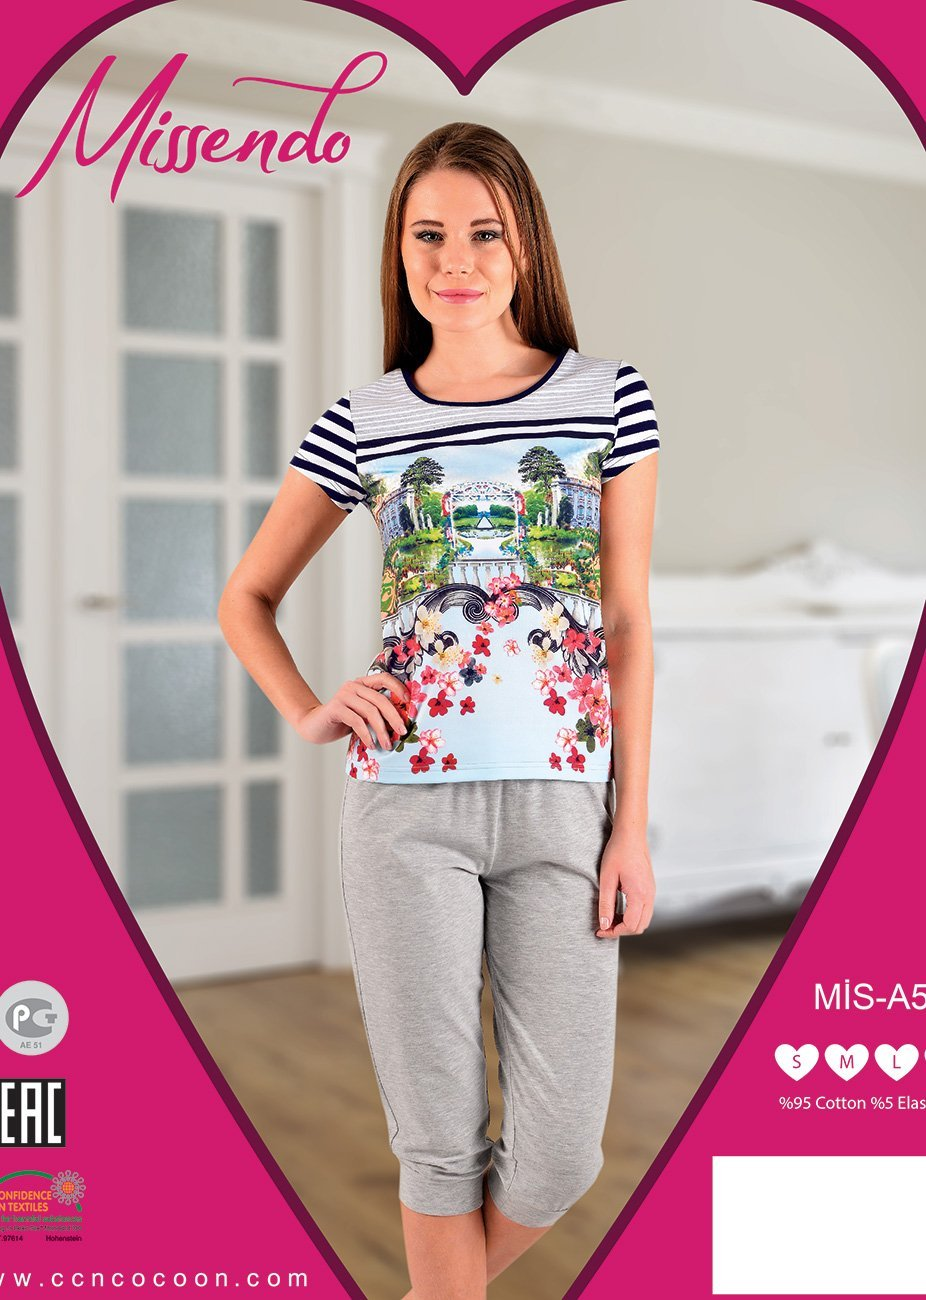 A-507 Город - комплект (футболка+бриджи) Missendo